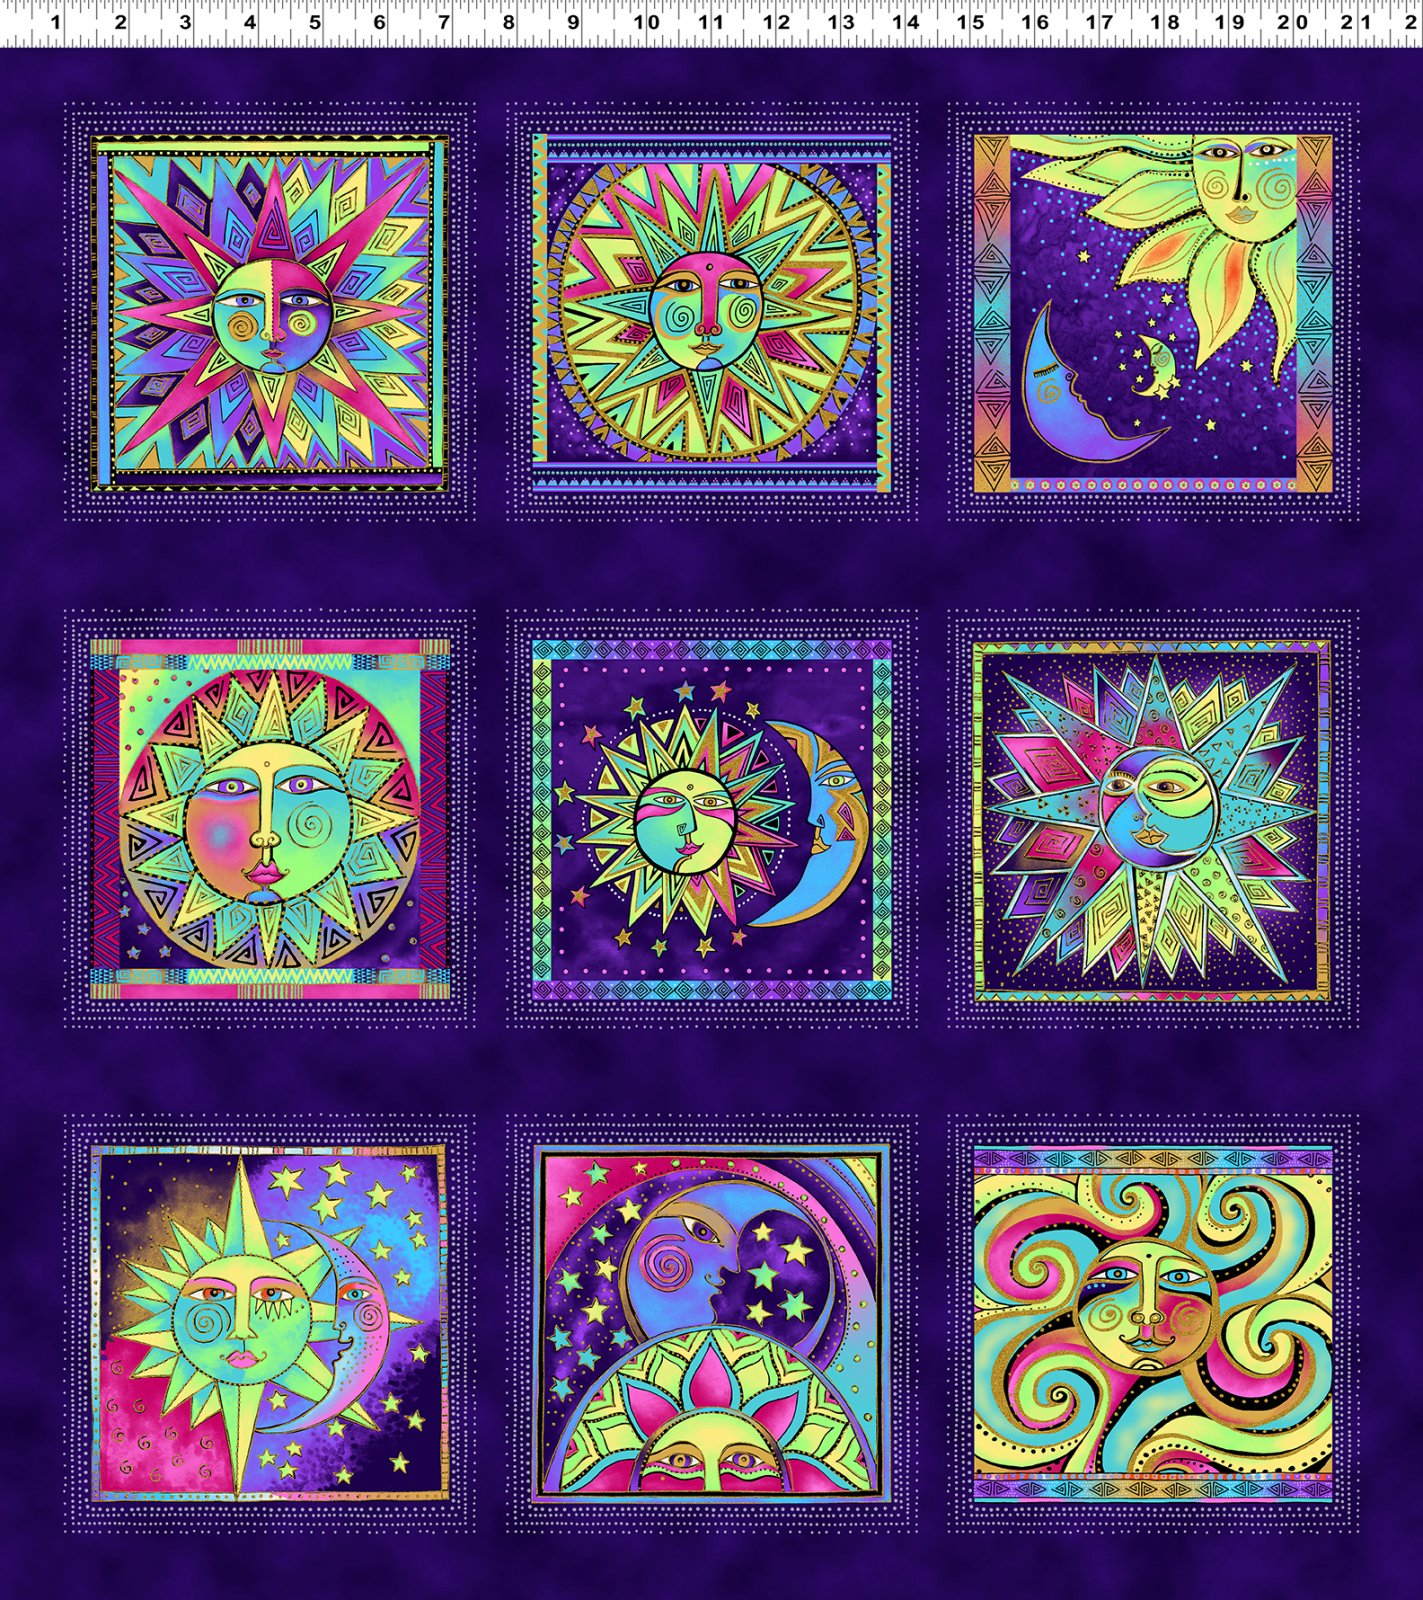 Dark Purple Metallic Blocks - Celestial Magic by Laurel Burch - Y3159-28M